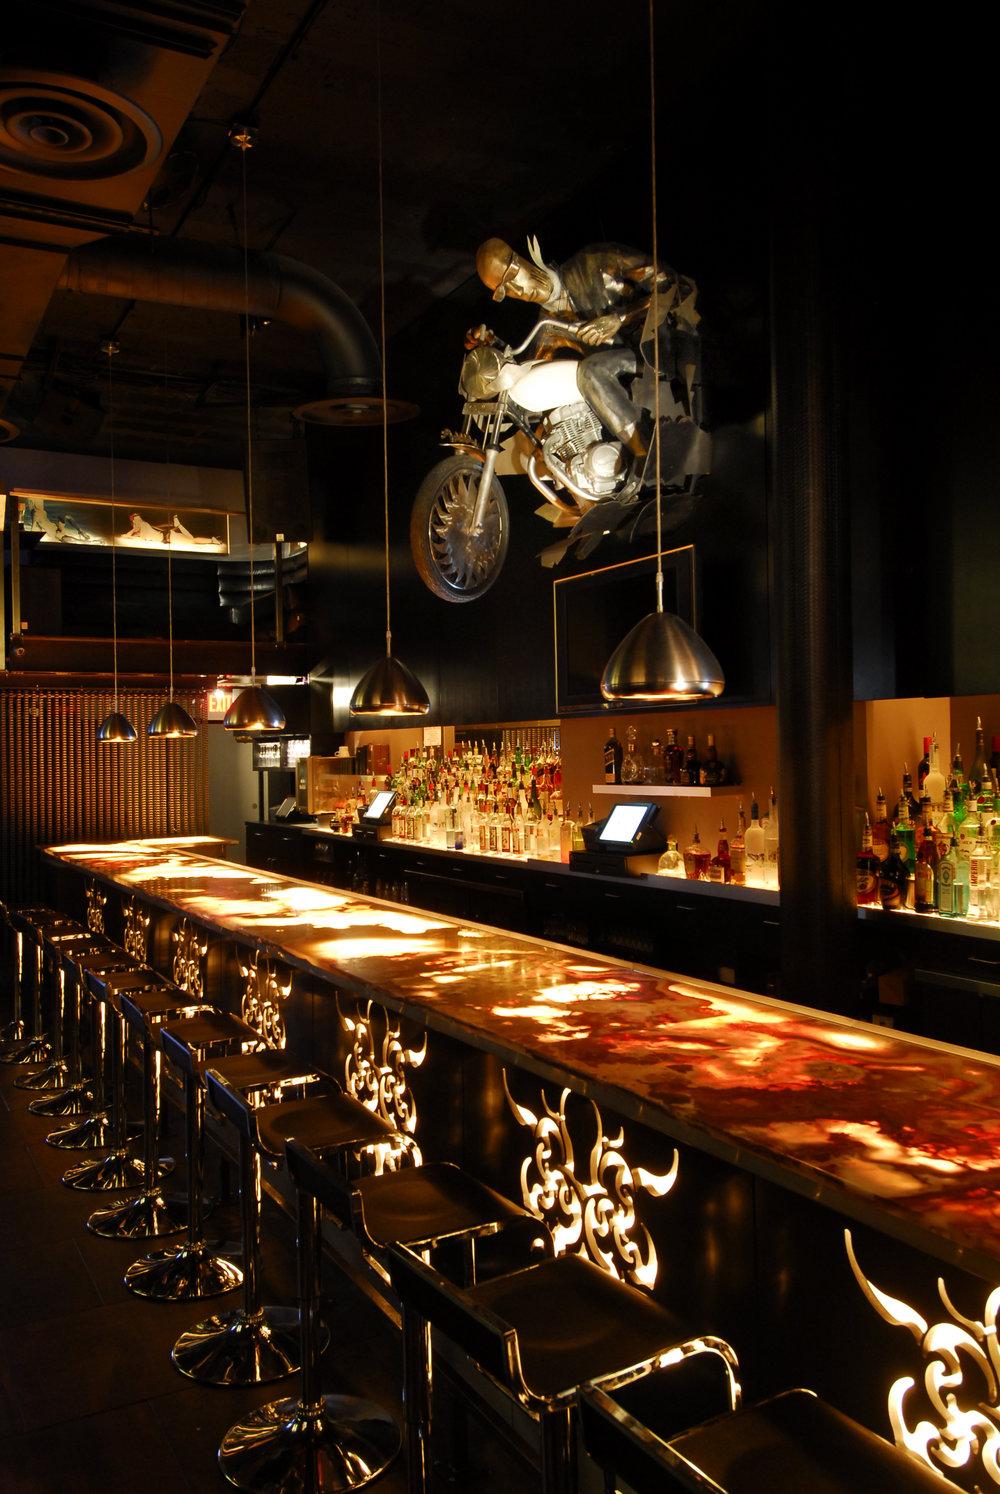 studio-saint-bars-and-restaurants-tattoo-bar-washington-dc-4